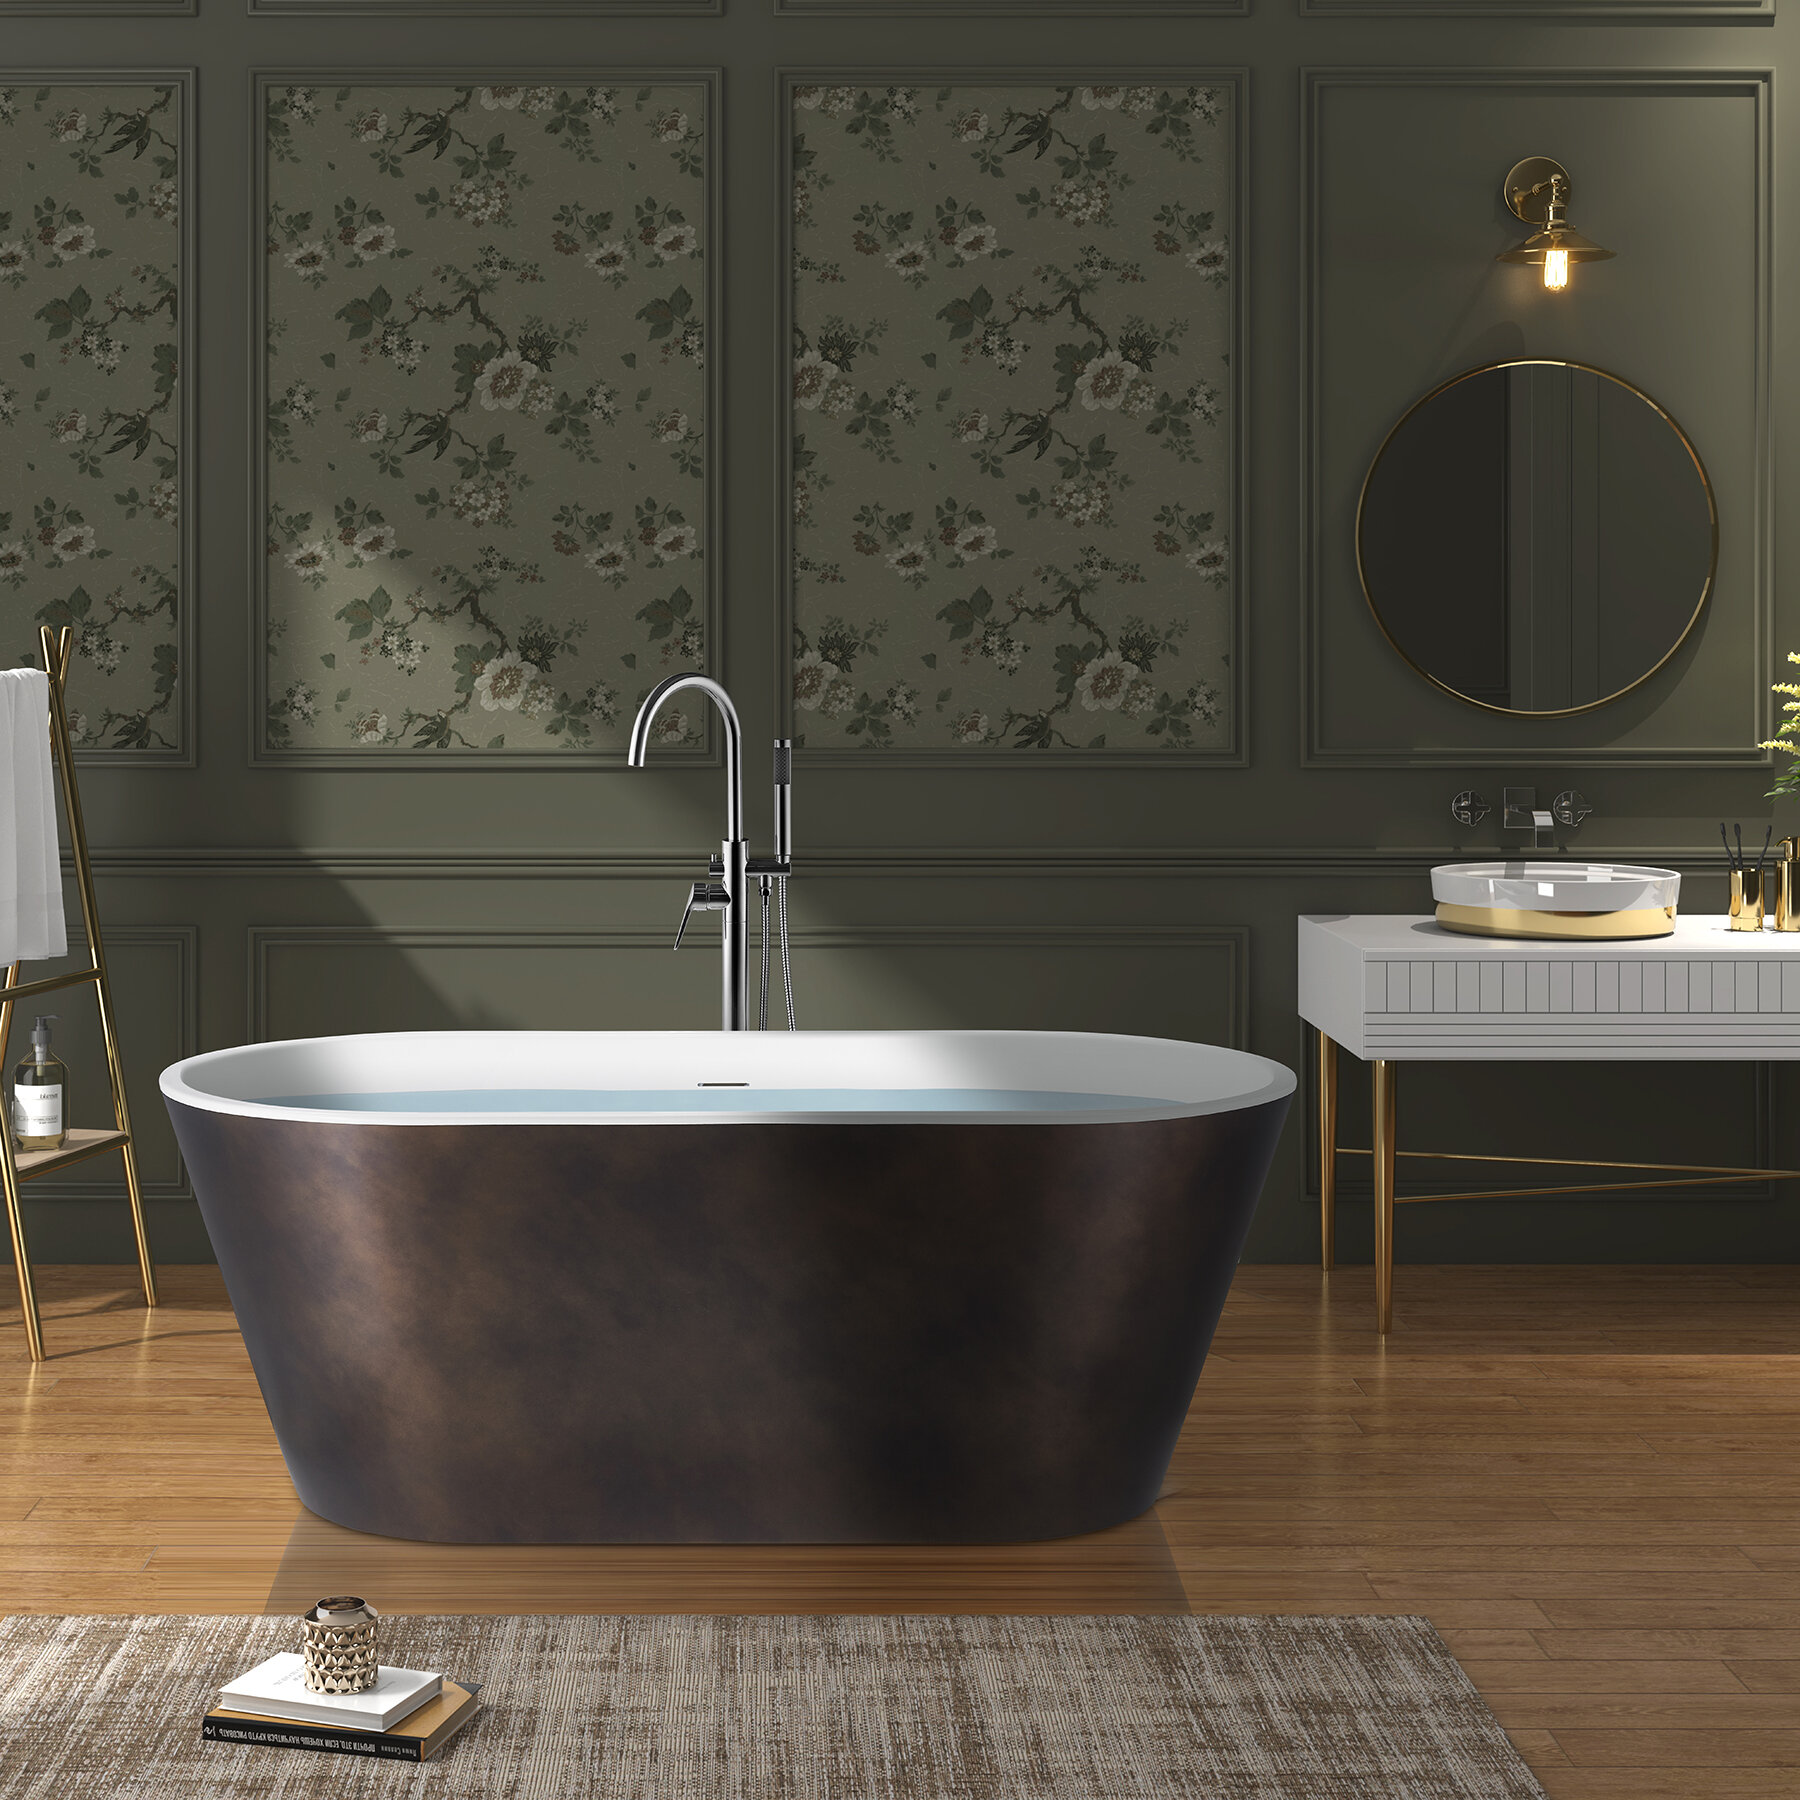 Picture of: Akdy Freestanding Bathtub 67 Inch Matt Antique Brass Acrylic Bathtub Modern Stand Alone Tub Wayfair Ca